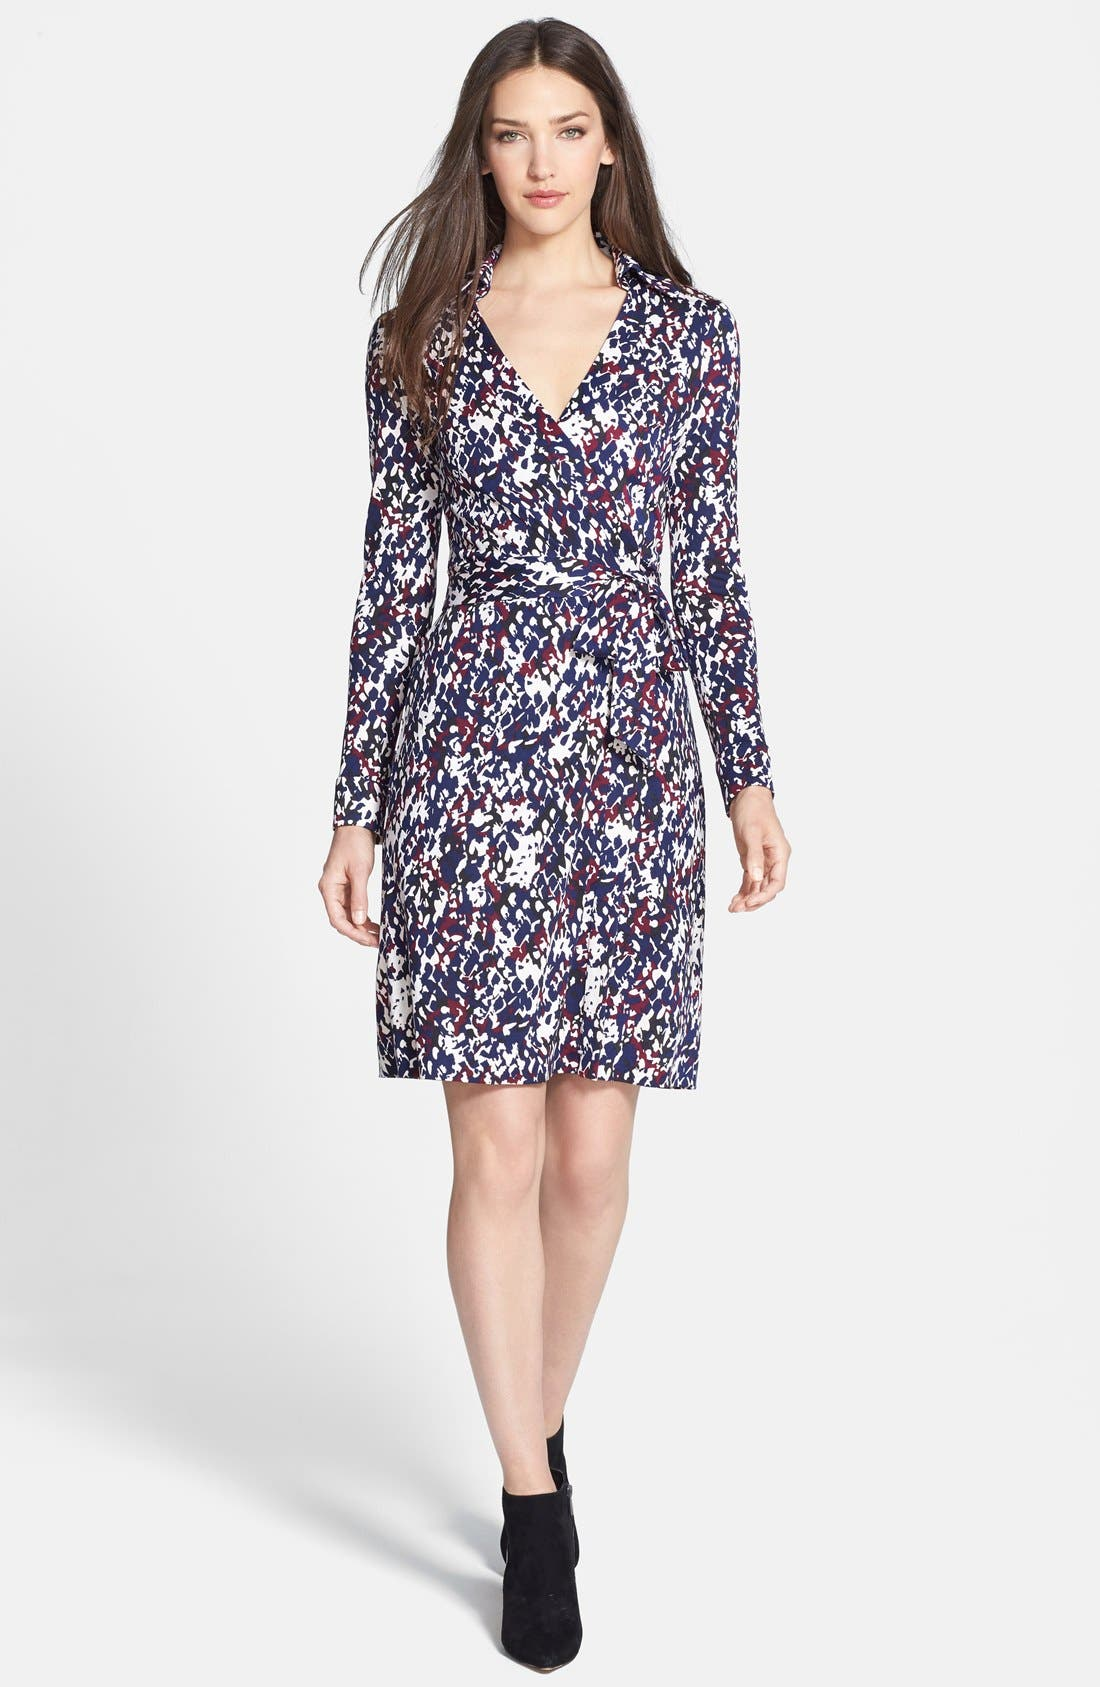 Alternate Image 1 Selected - Diane von Furstenberg 'New Jeanne Two' Print Silk Wrap Dress